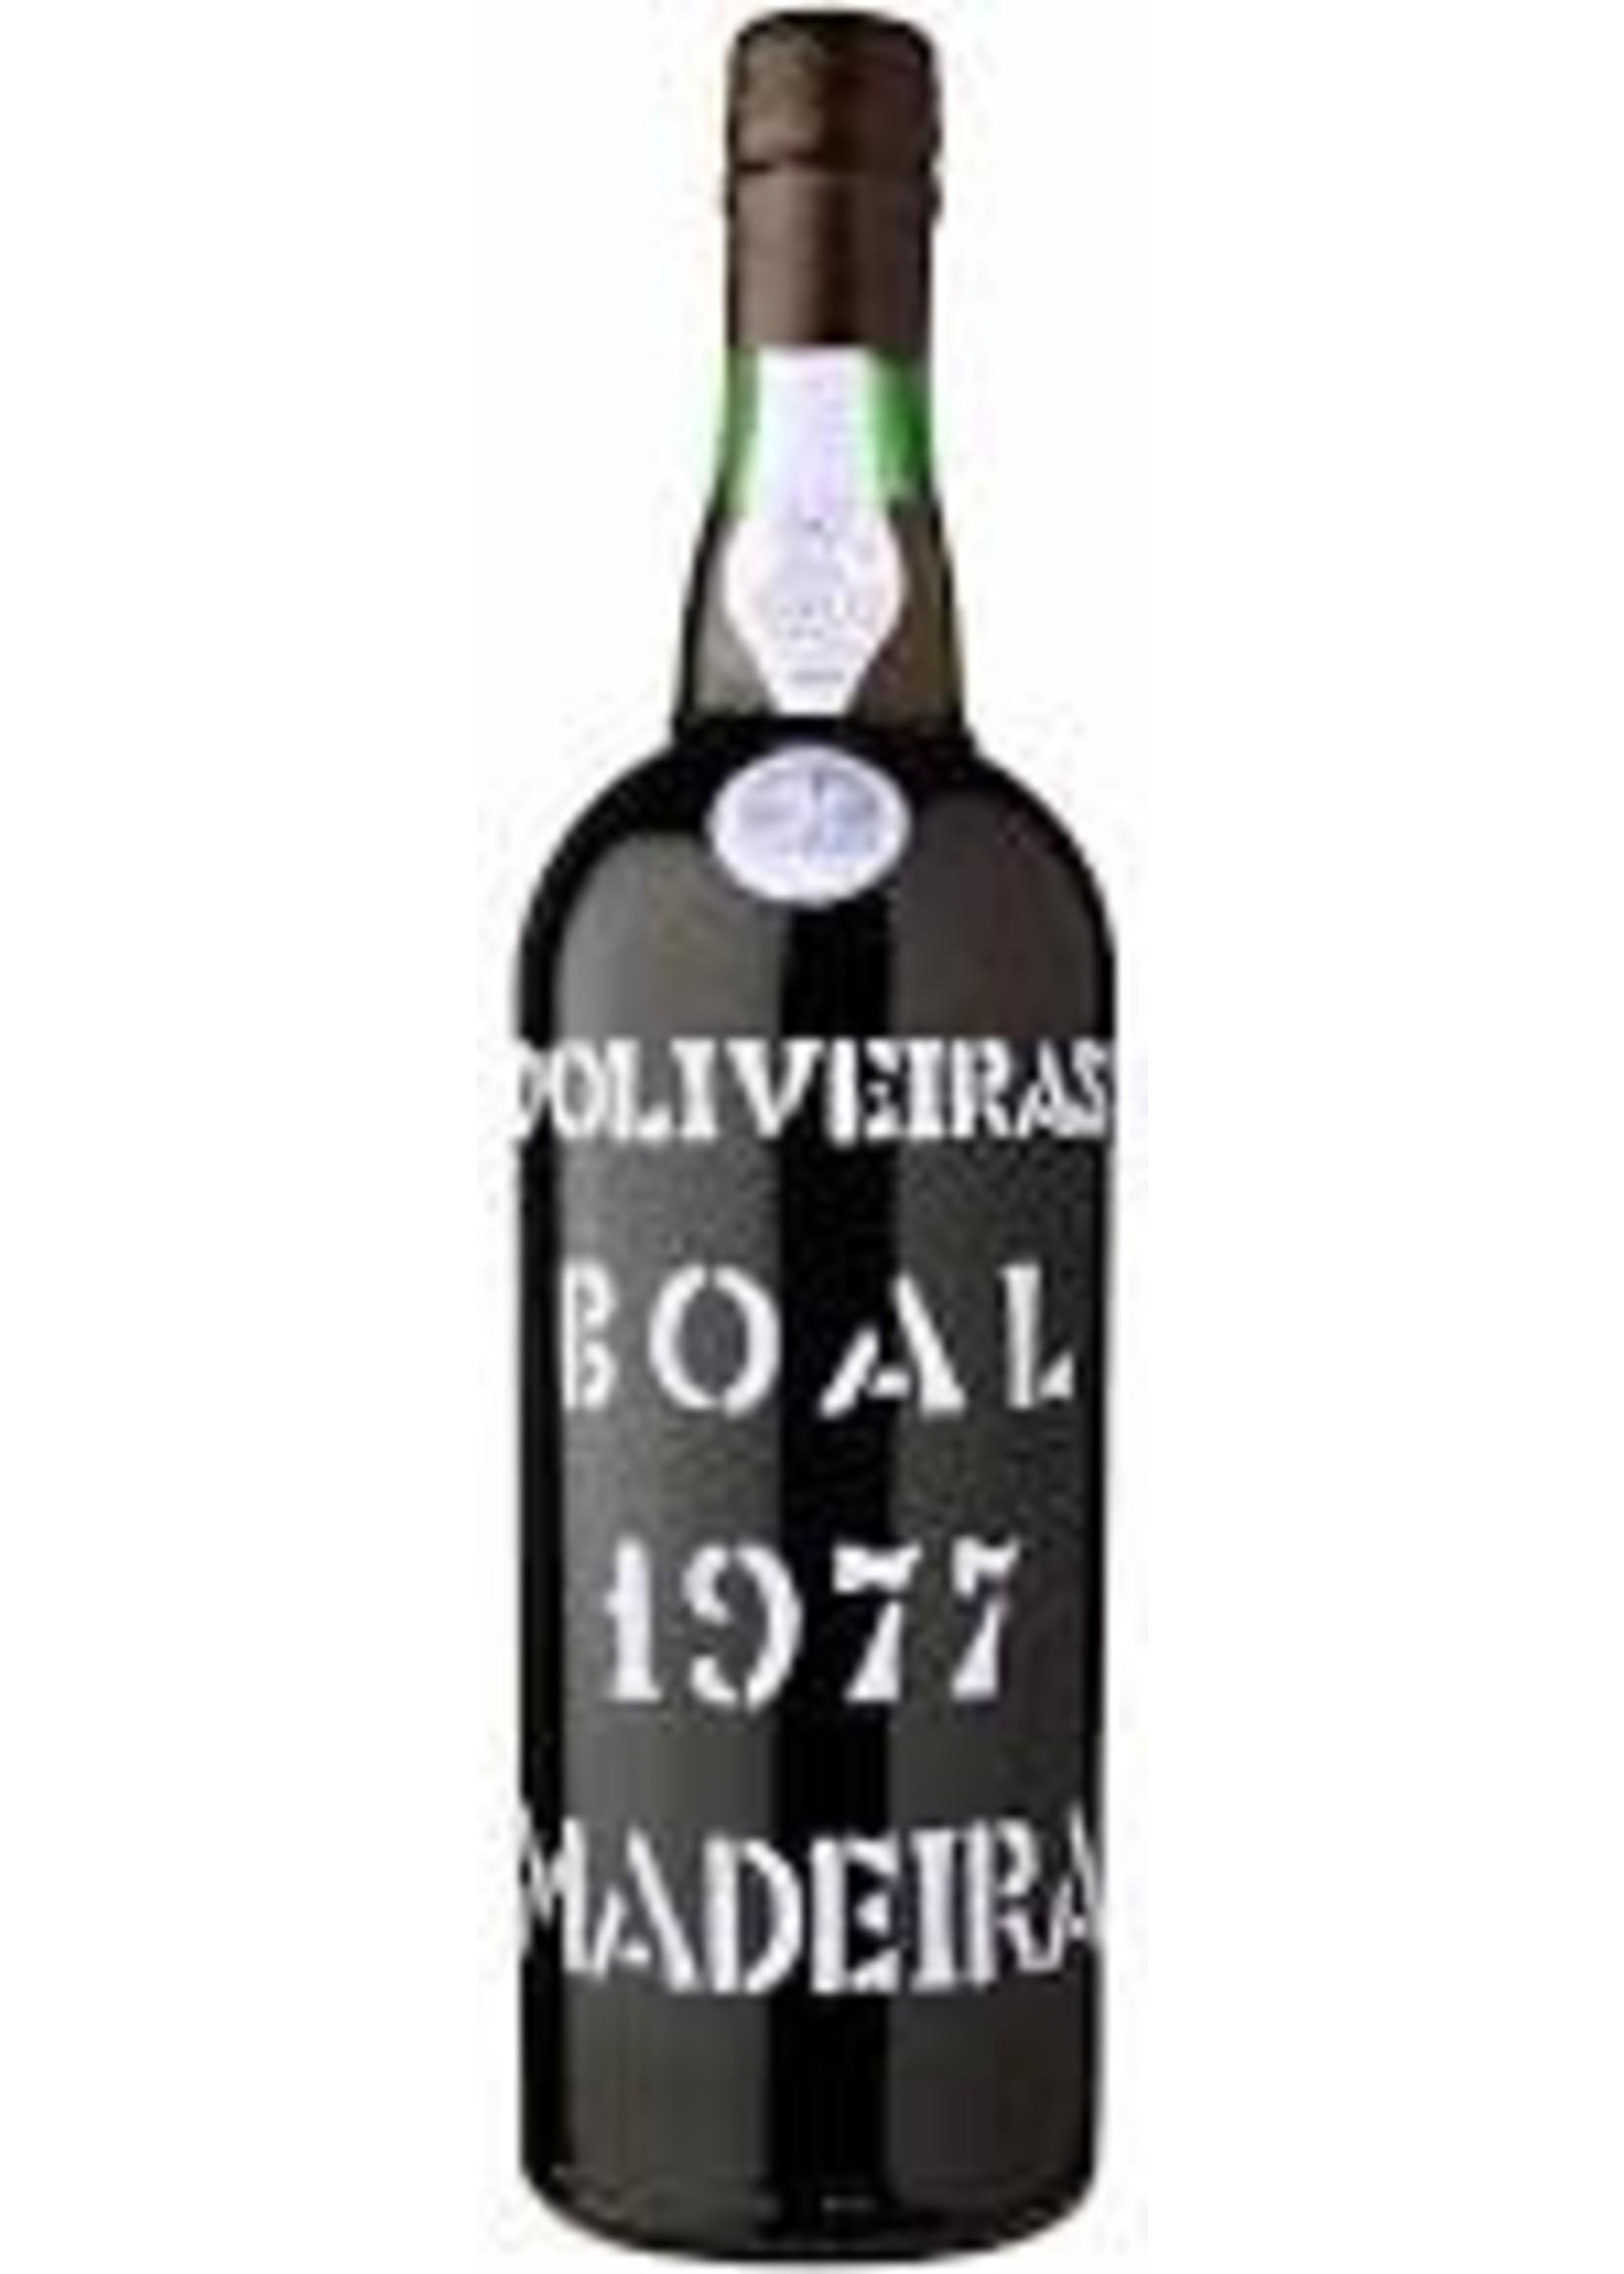 D'Oliveira 1977 Bual Maderia 750ml